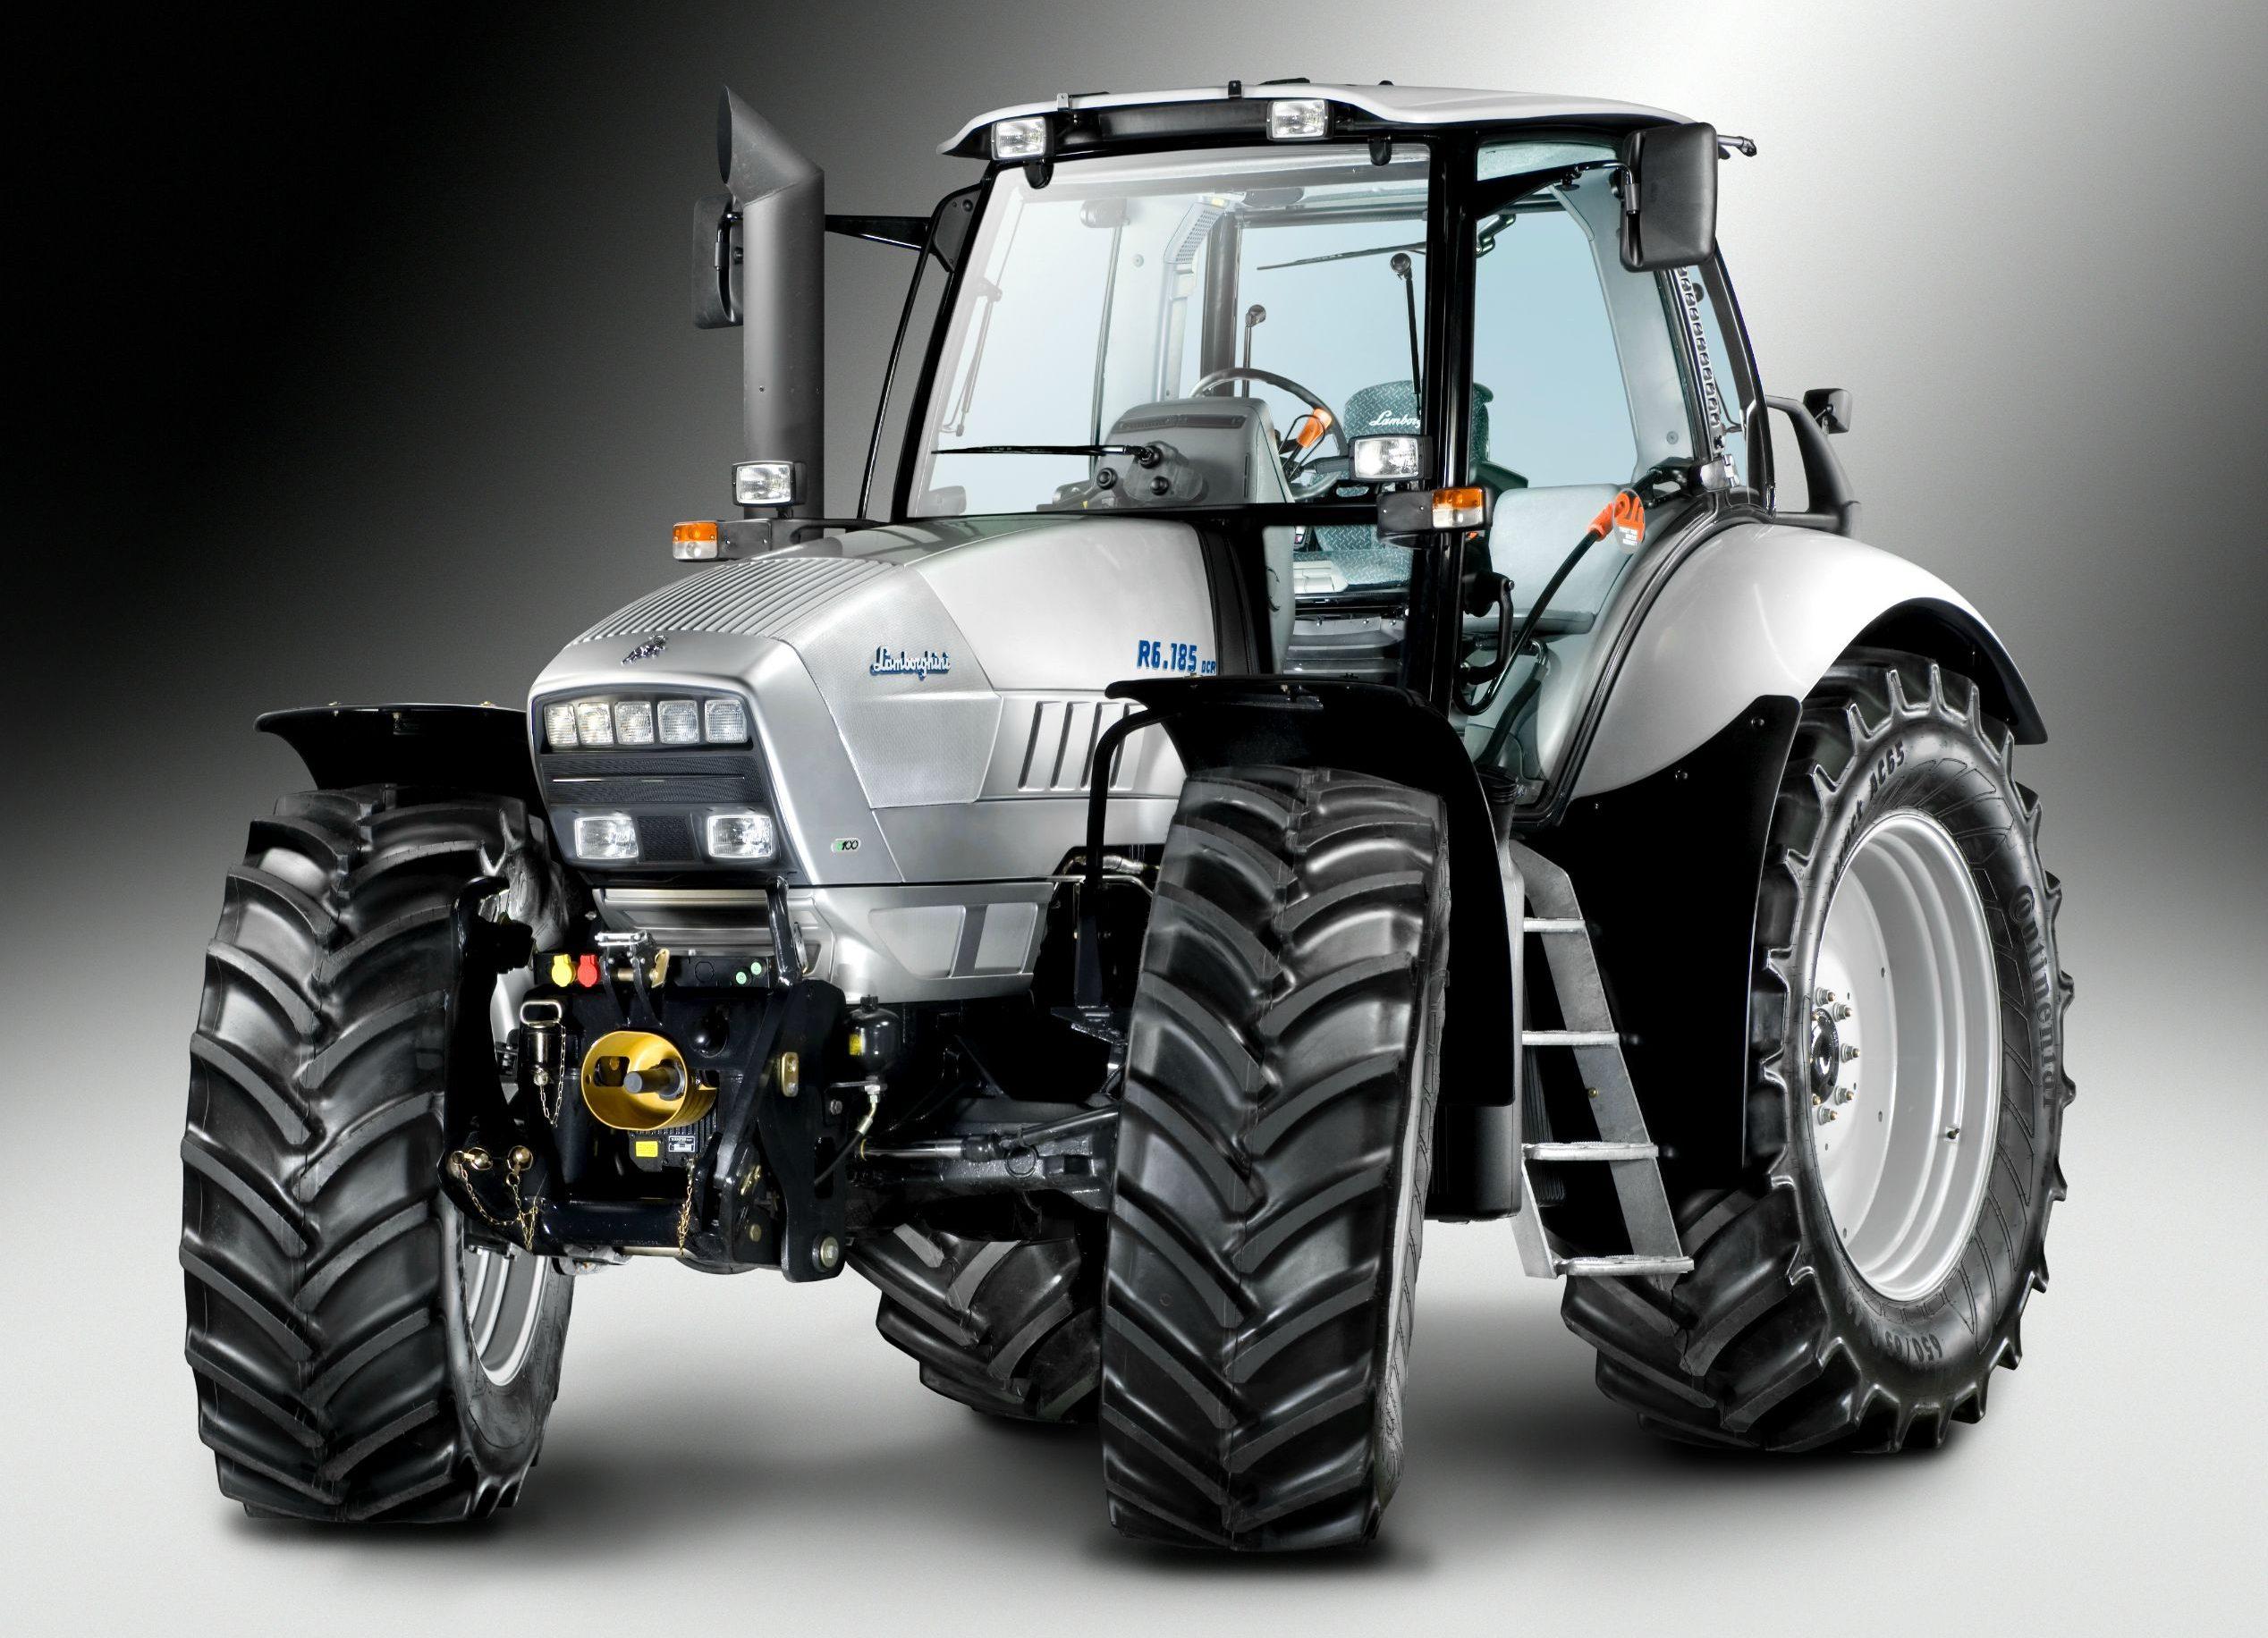 Oil Suitable For Lamborghini Tractor Including 15w/40, 10w